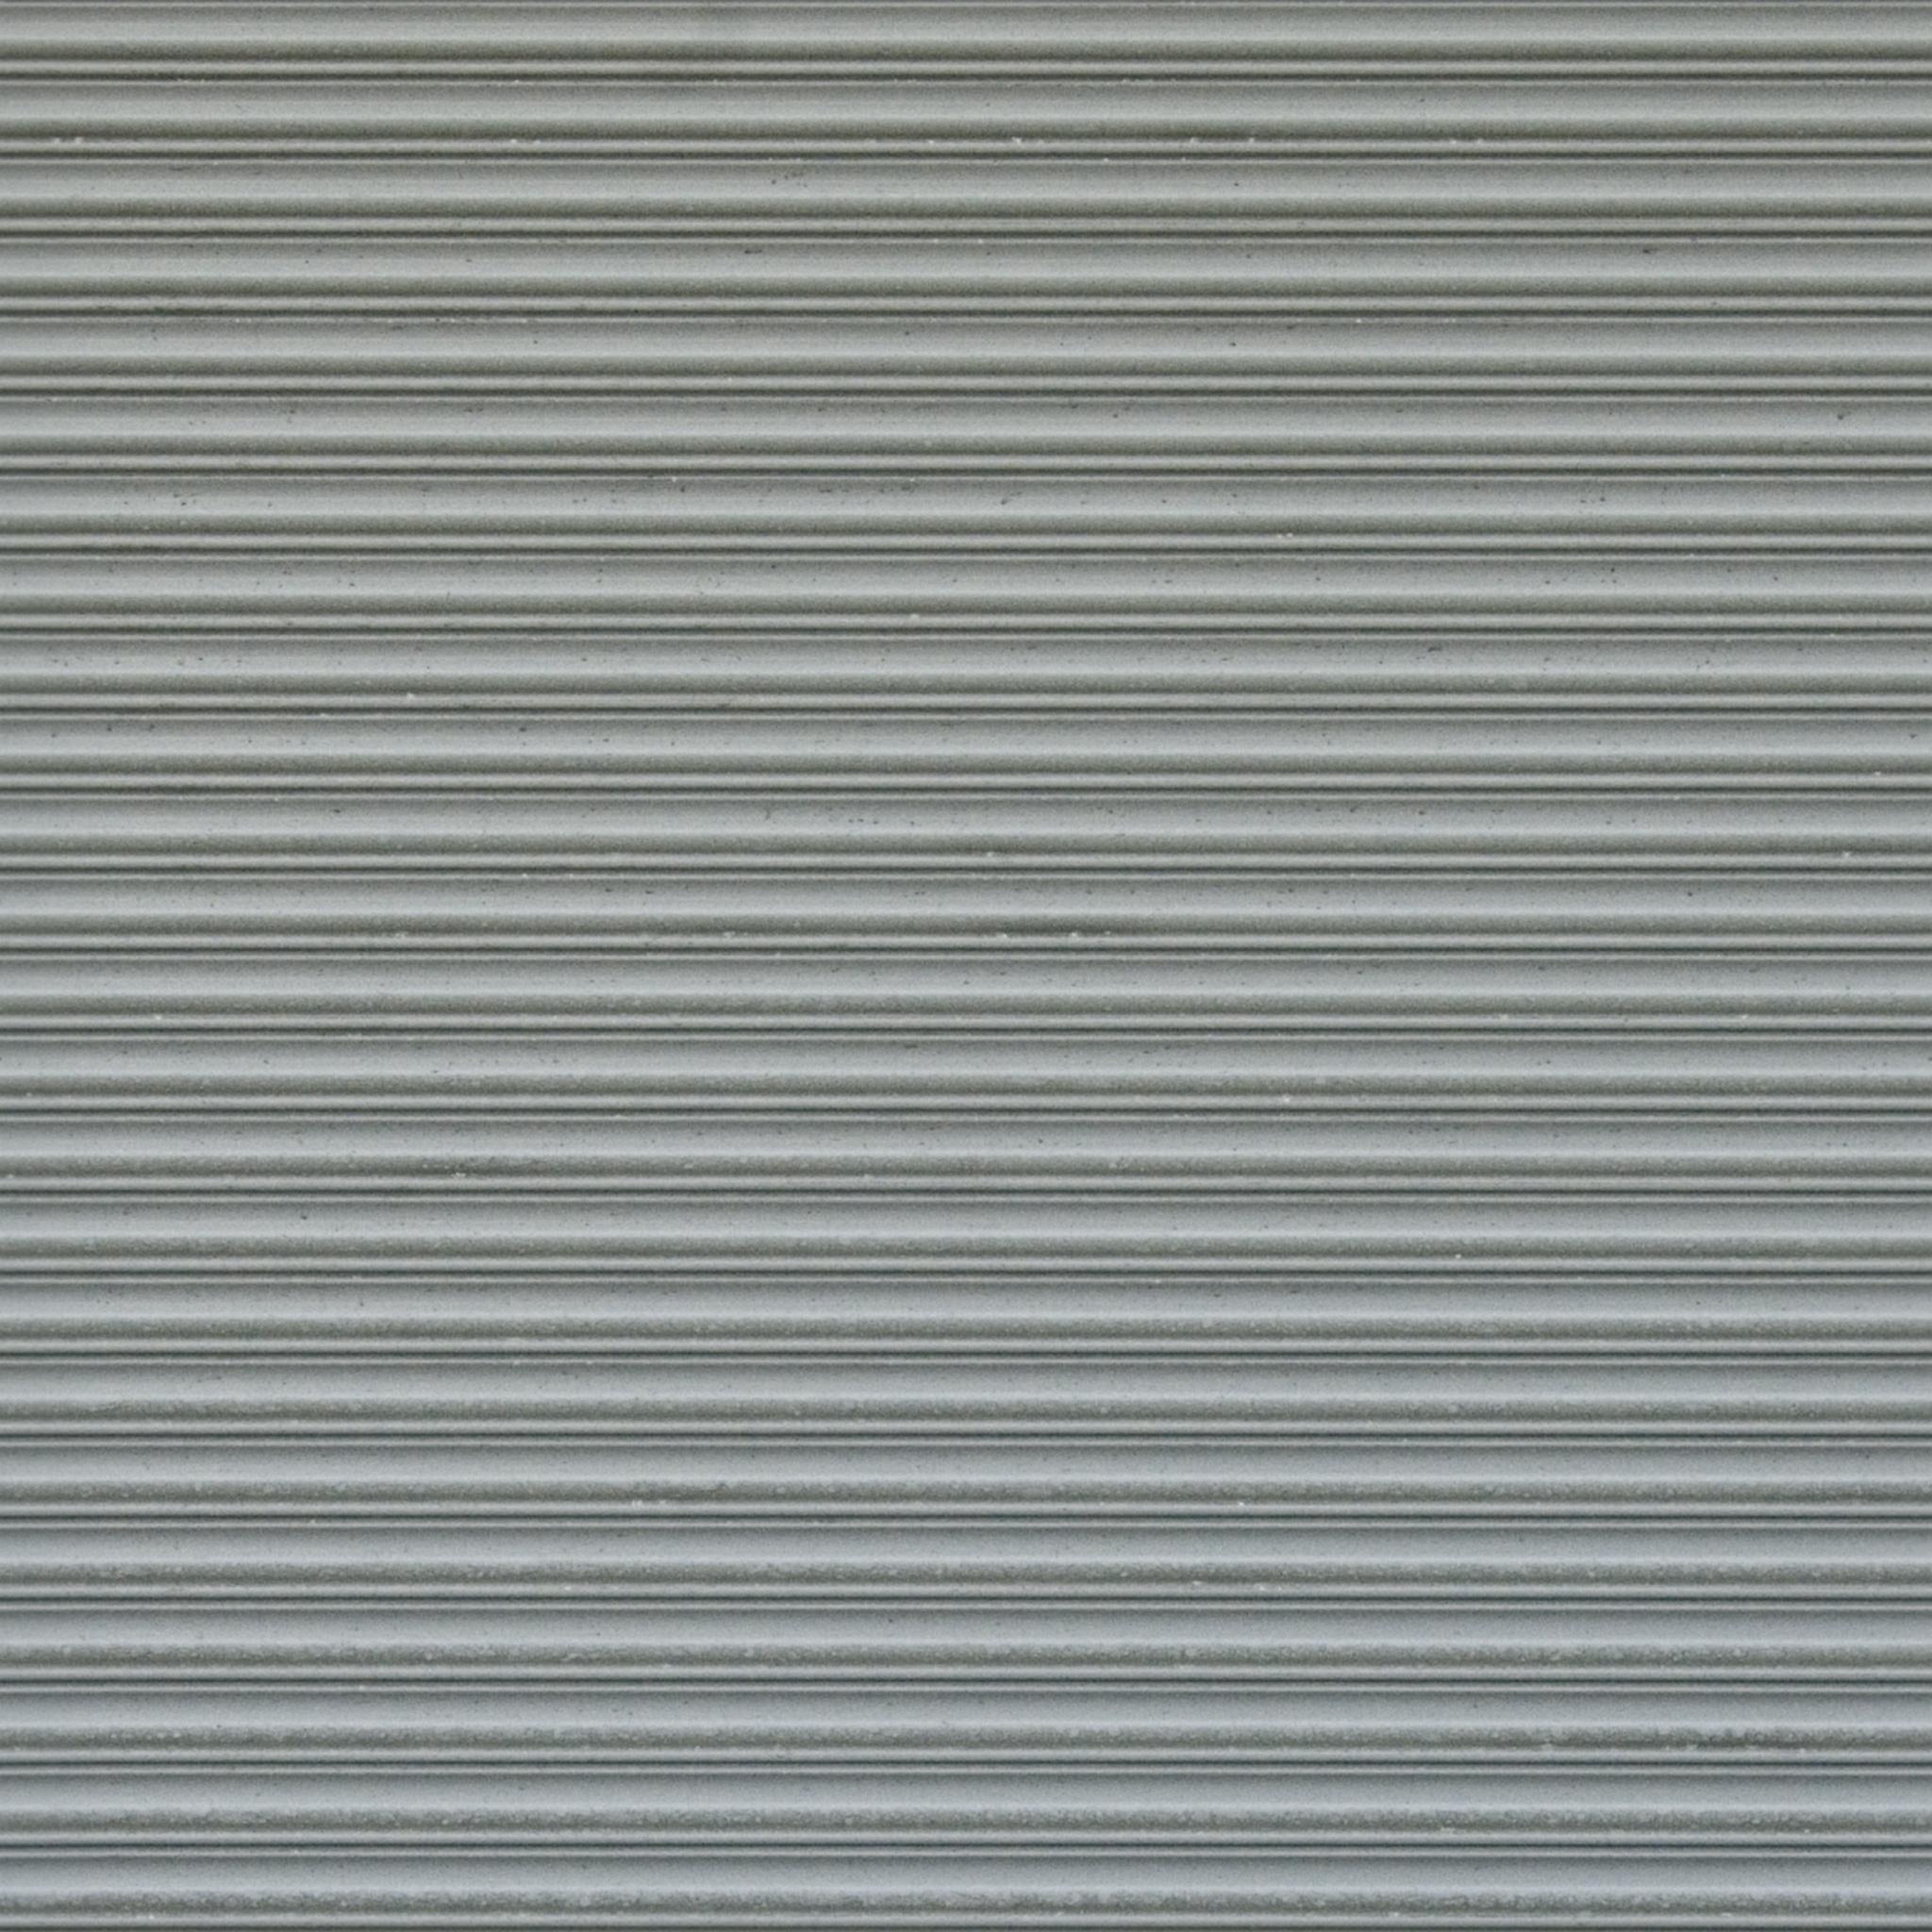 Corrugated Steel Siding.jpg